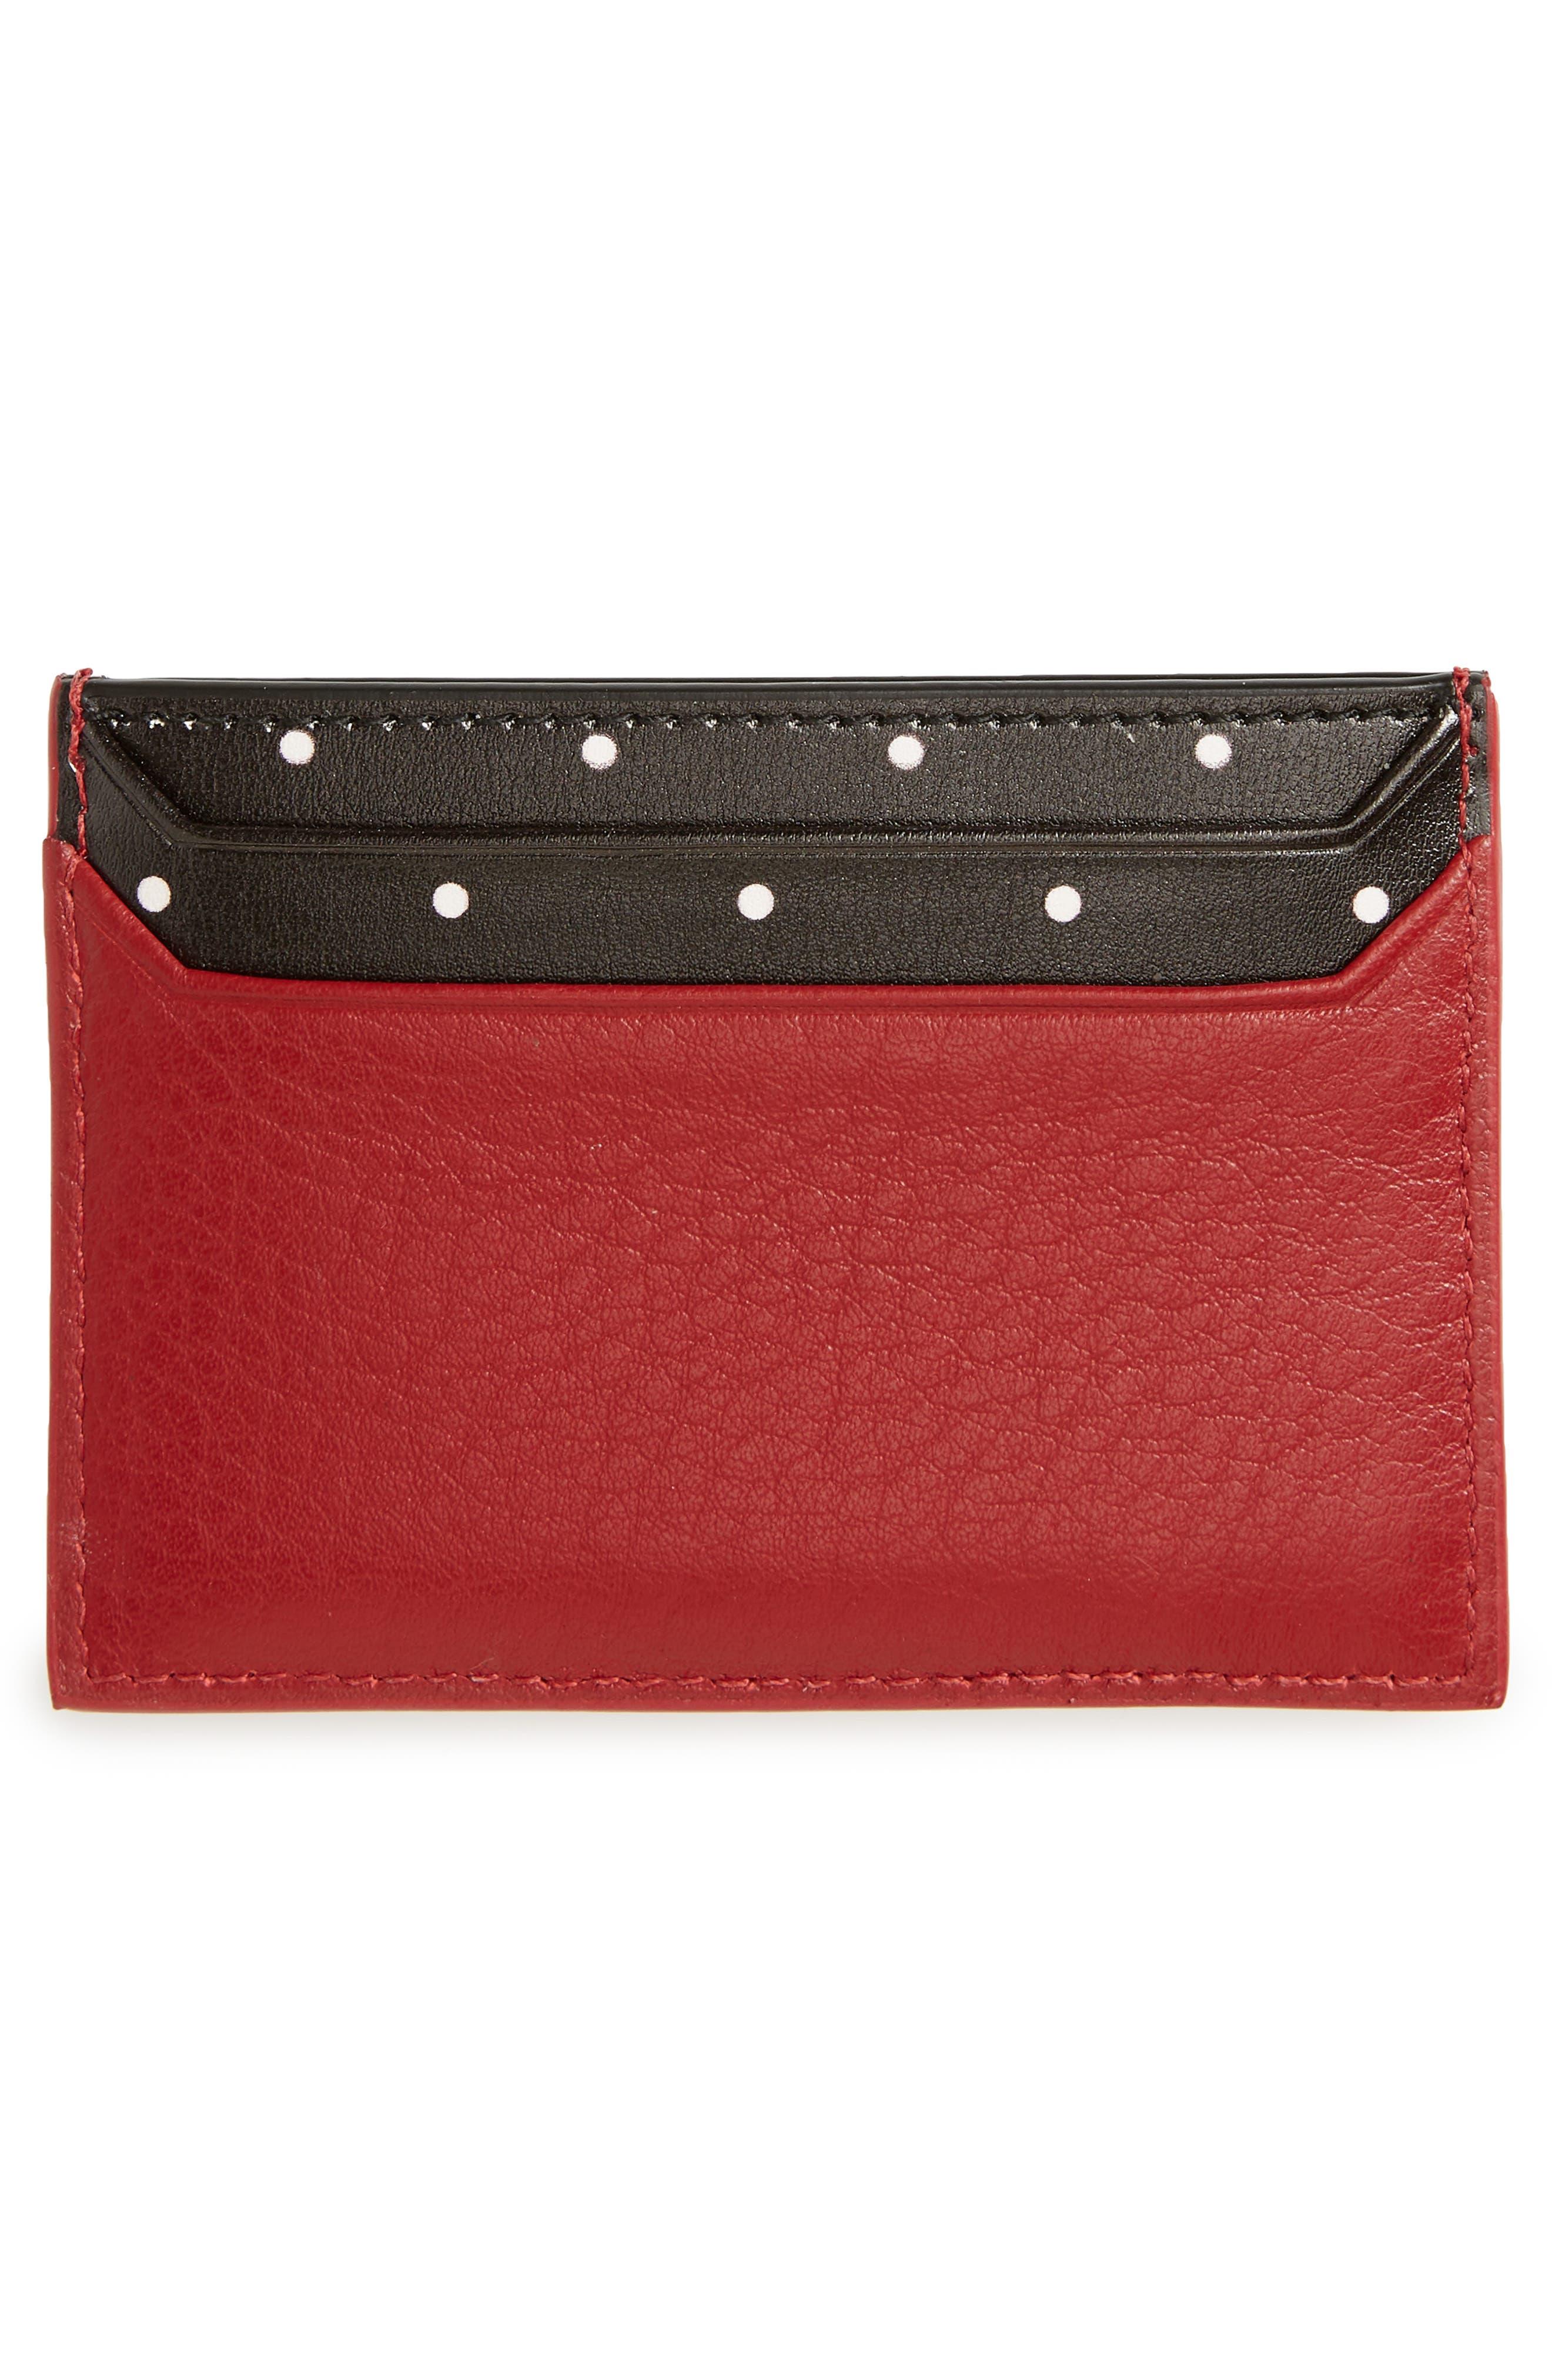 KATE SPADE NEW YORK, blake street - dot lynleigh leather card case, Alternate thumbnail 2, color, 600